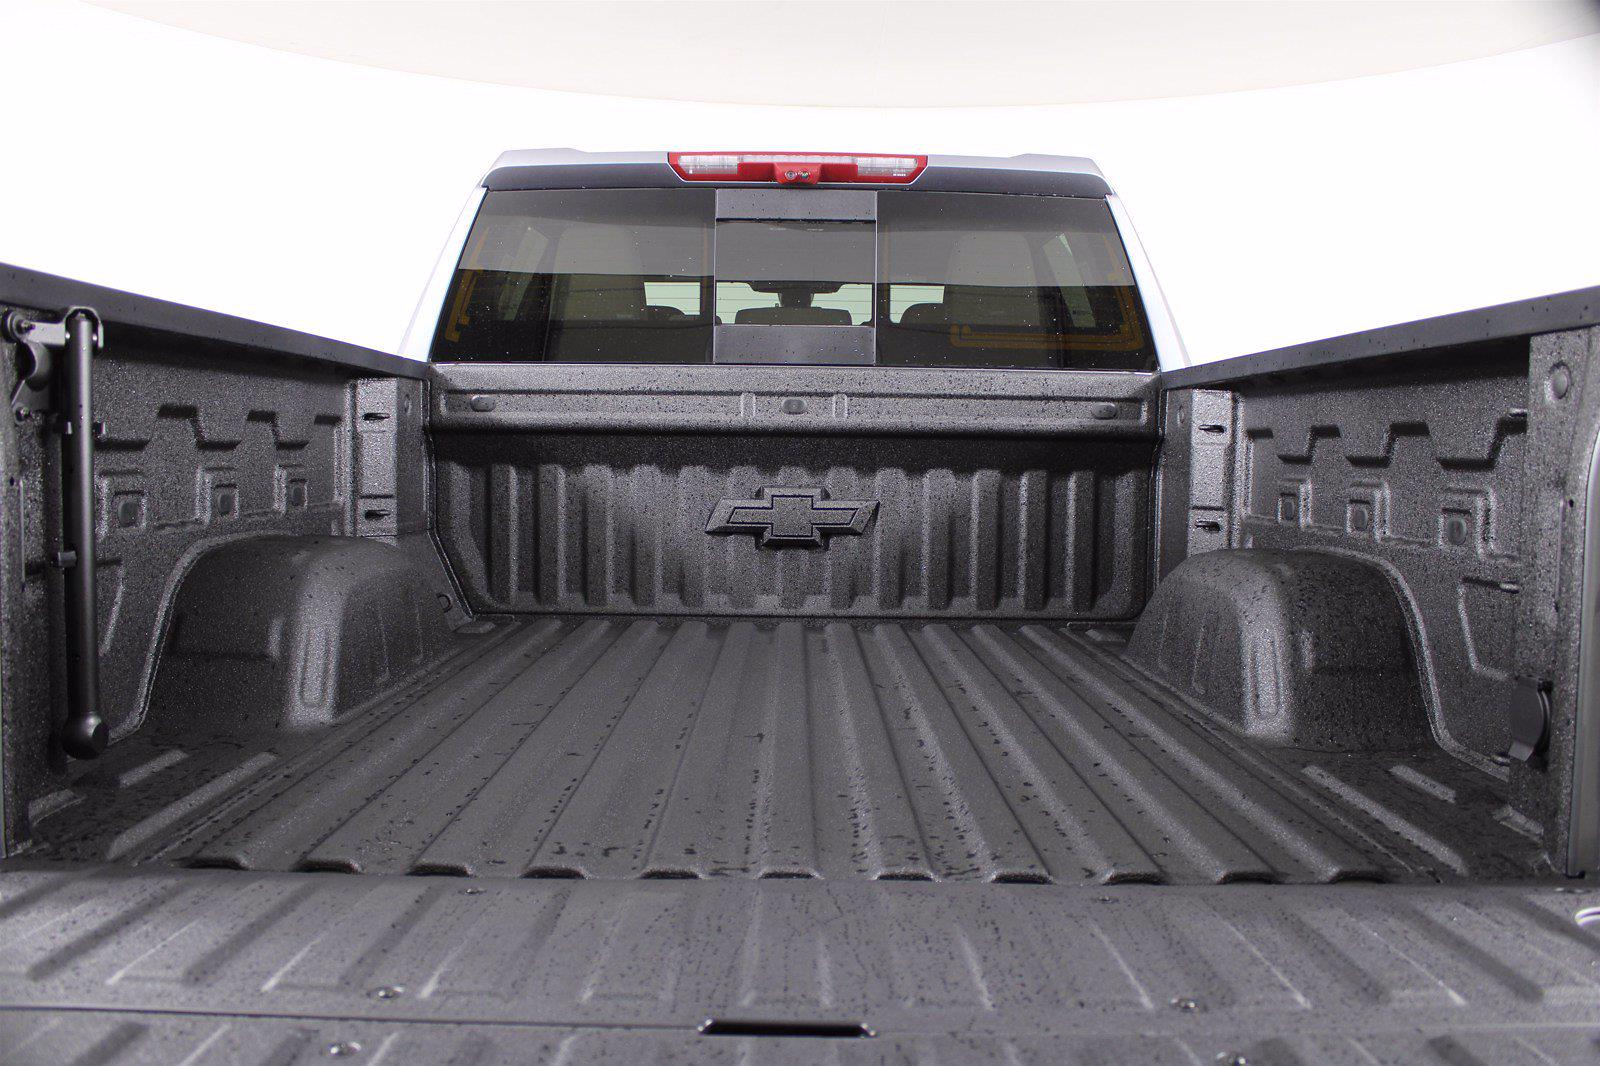 2021 Chevrolet Silverado 1500 Crew Cab 4x4, Pickup #D110776 - photo 8